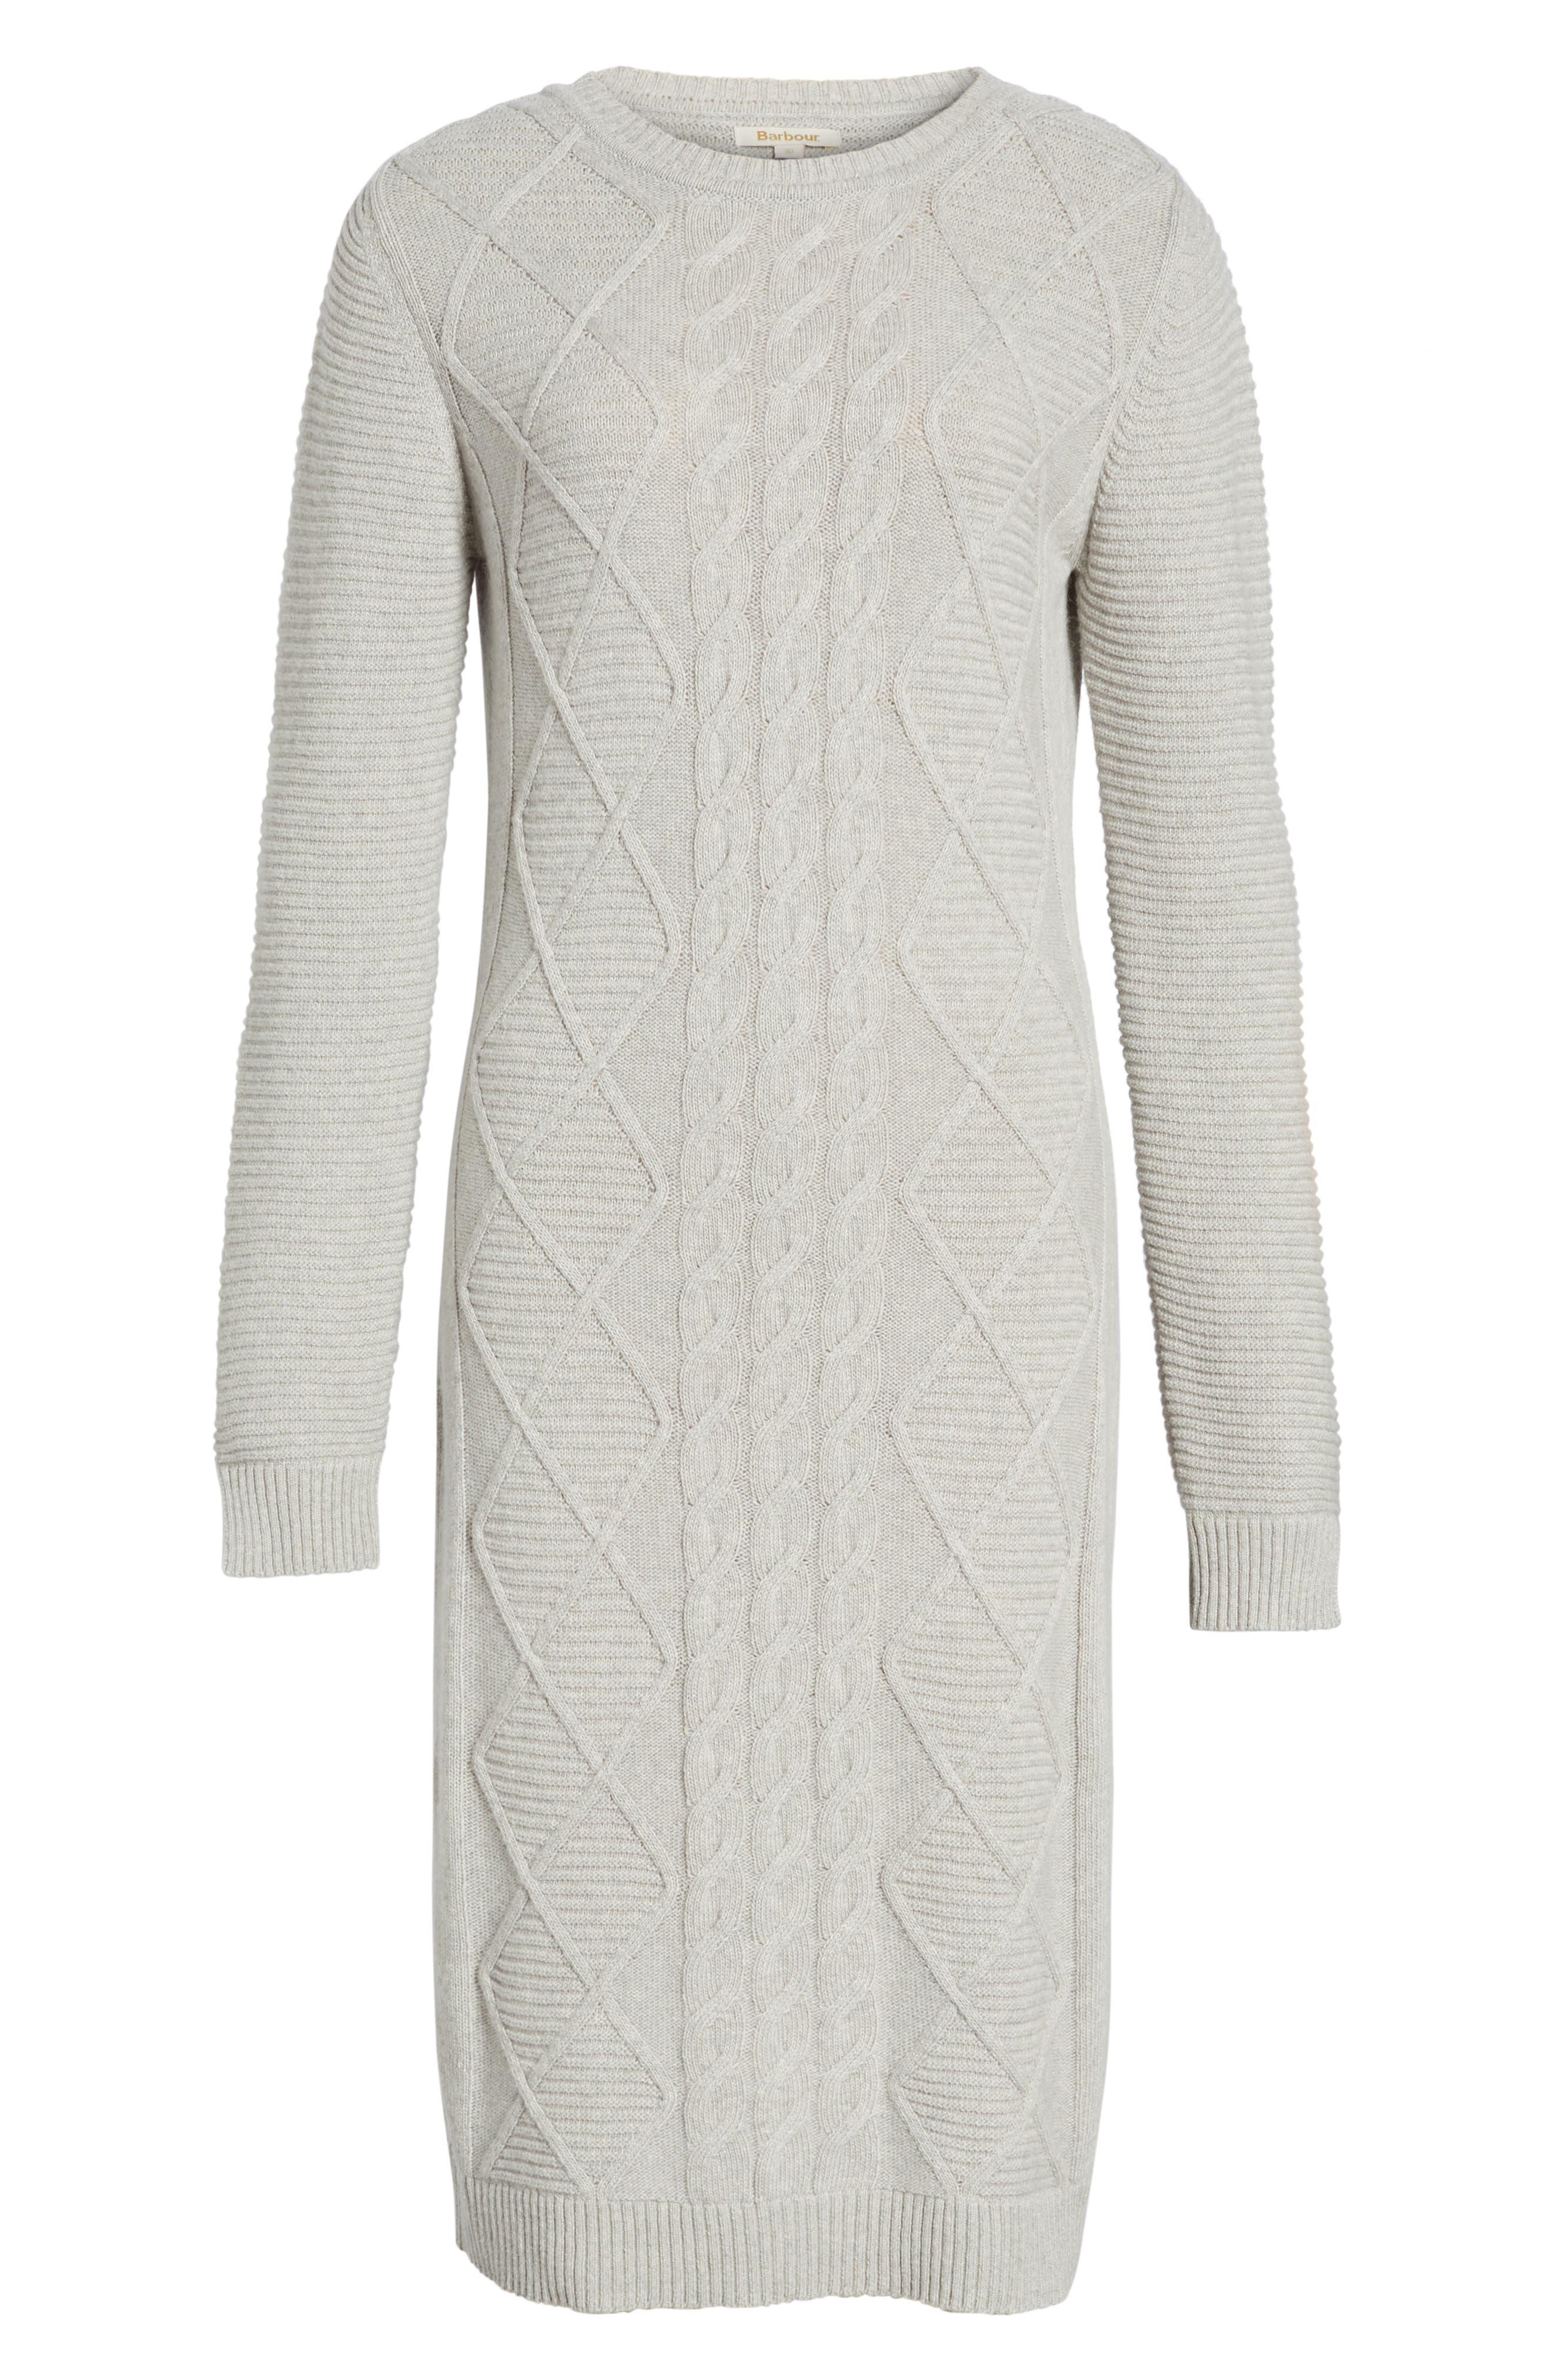 Emmanuel Cable Knit Sweater Dress,                             Alternate thumbnail 6, color,                             050